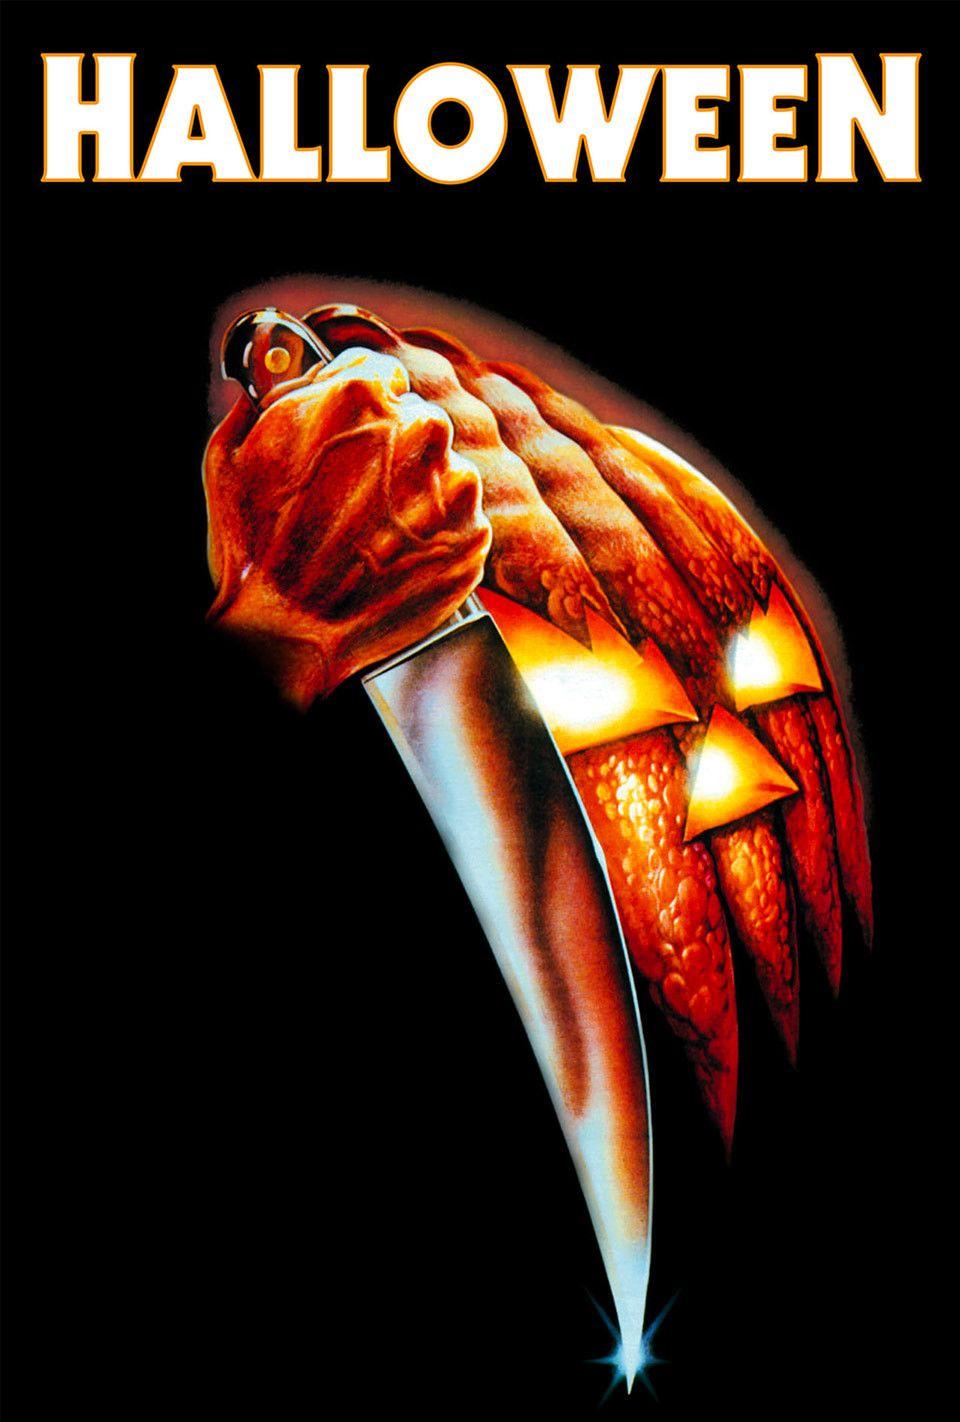 Read The Halloween 1978 Script Written By John Carpenter And Debra Hill Halloween 1978 Movies Michael Myers